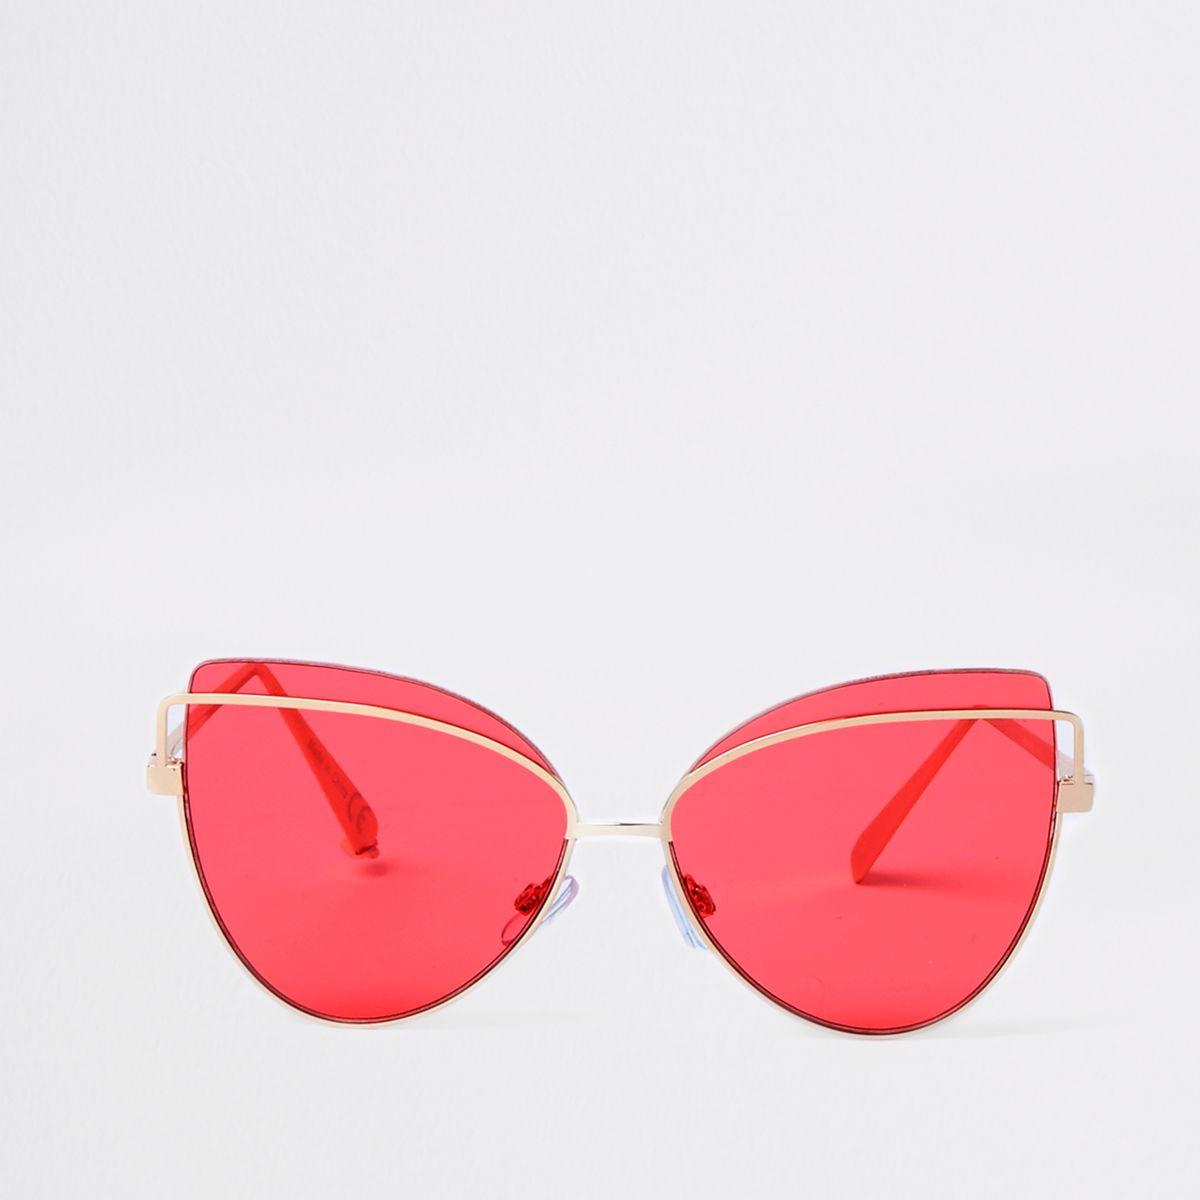 Gold tone cat eye pink lens sunglasses